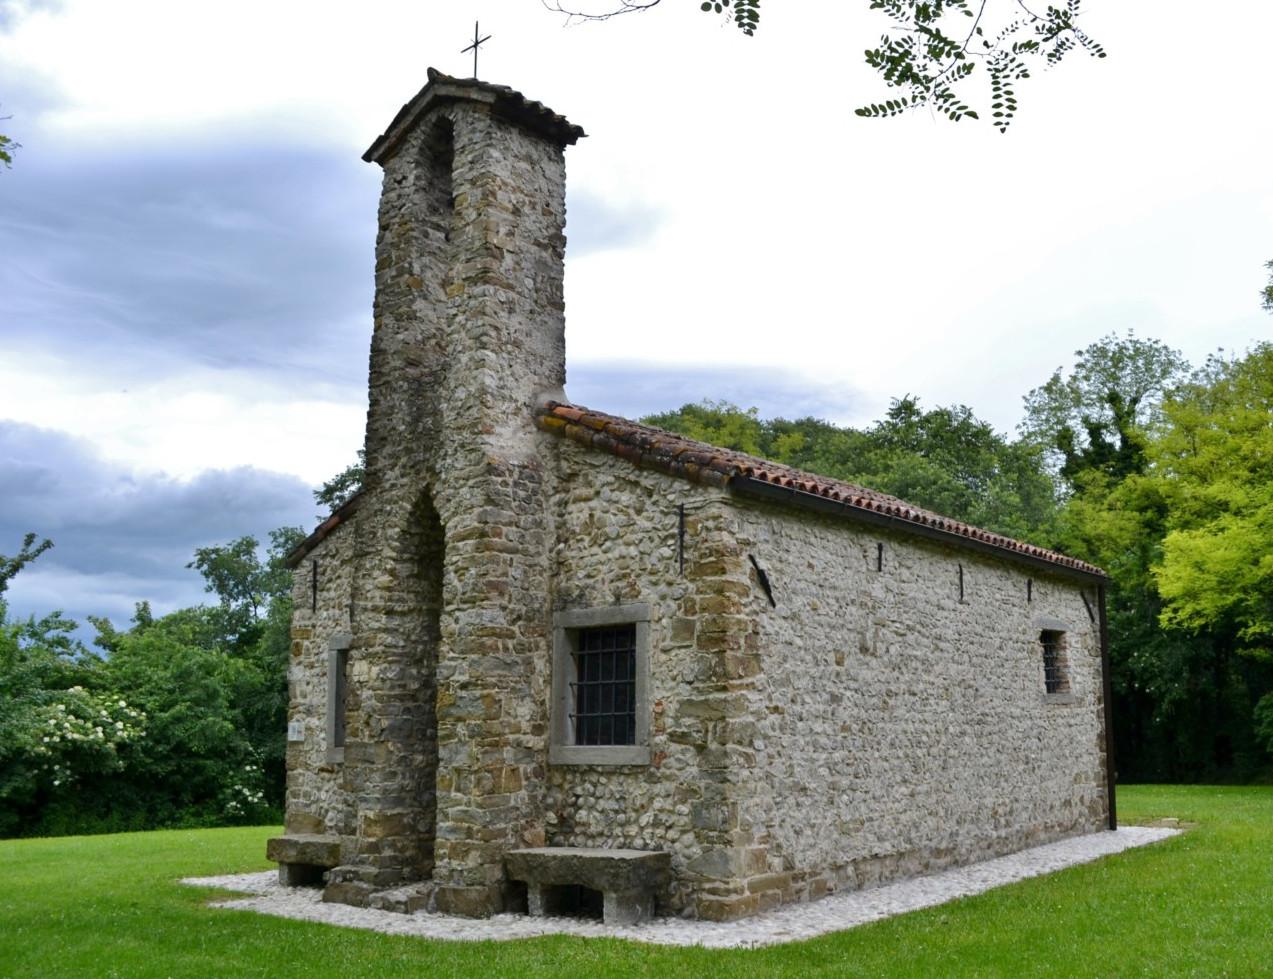 Chiesa-di-San-Marco-a-Clauiano